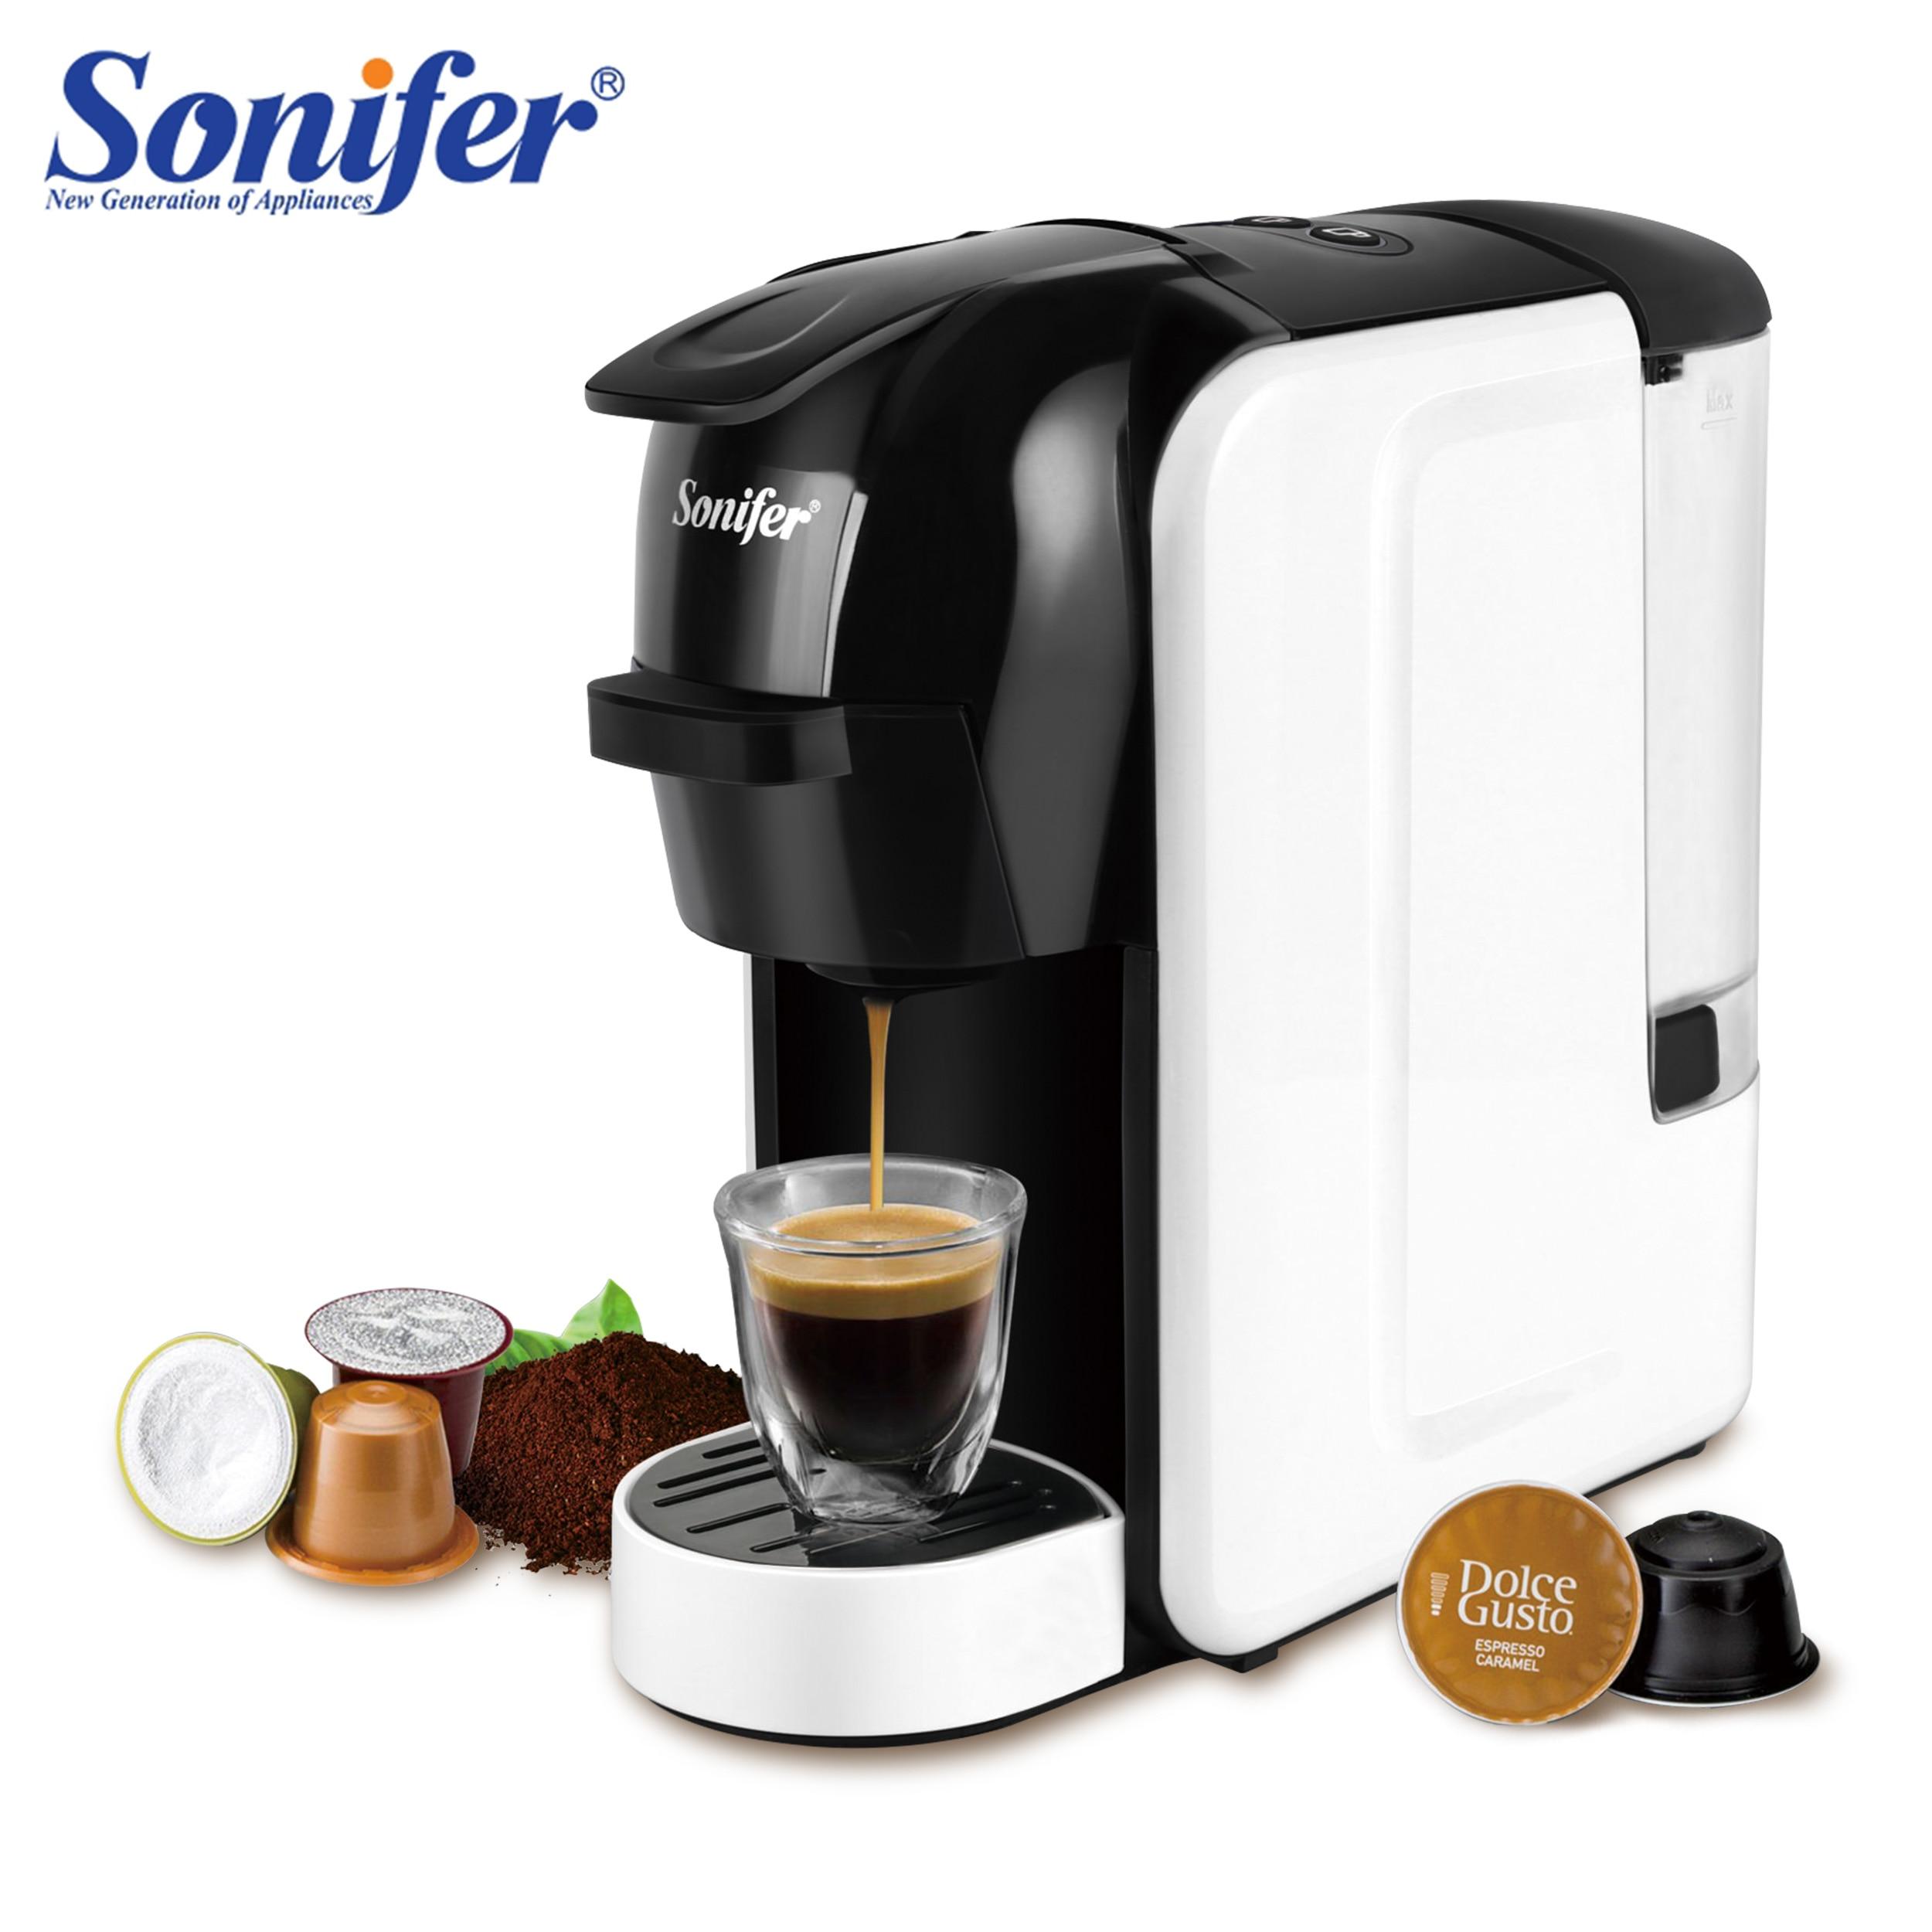 Italian Espresso Electric Coffee Capsule Machine 3 In 1 For Nestle Capsules Kitchen Appliances 19 Bar Coffee Machine Sonifer